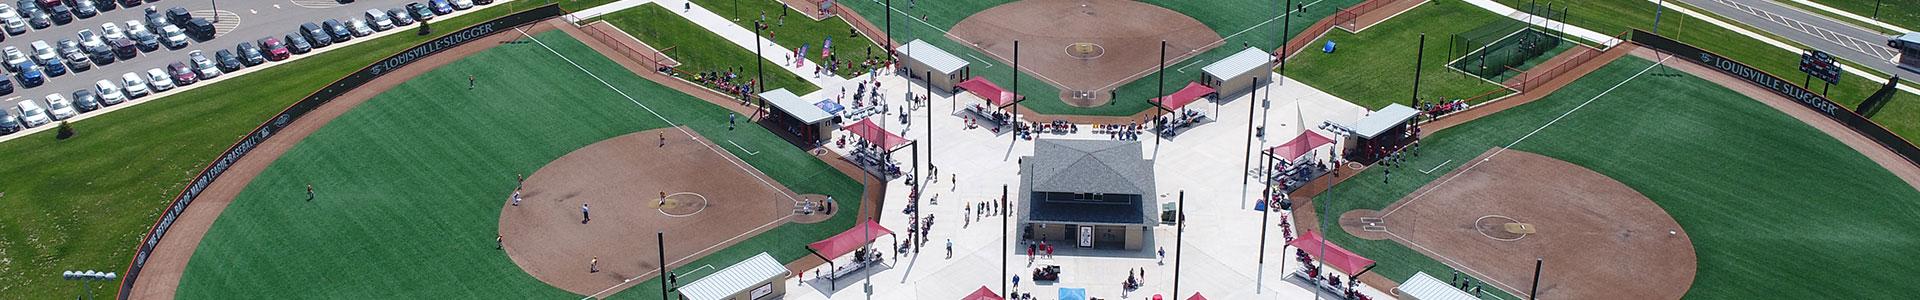 Louisville Events Calendar.Louisville Slugger Sports Complex